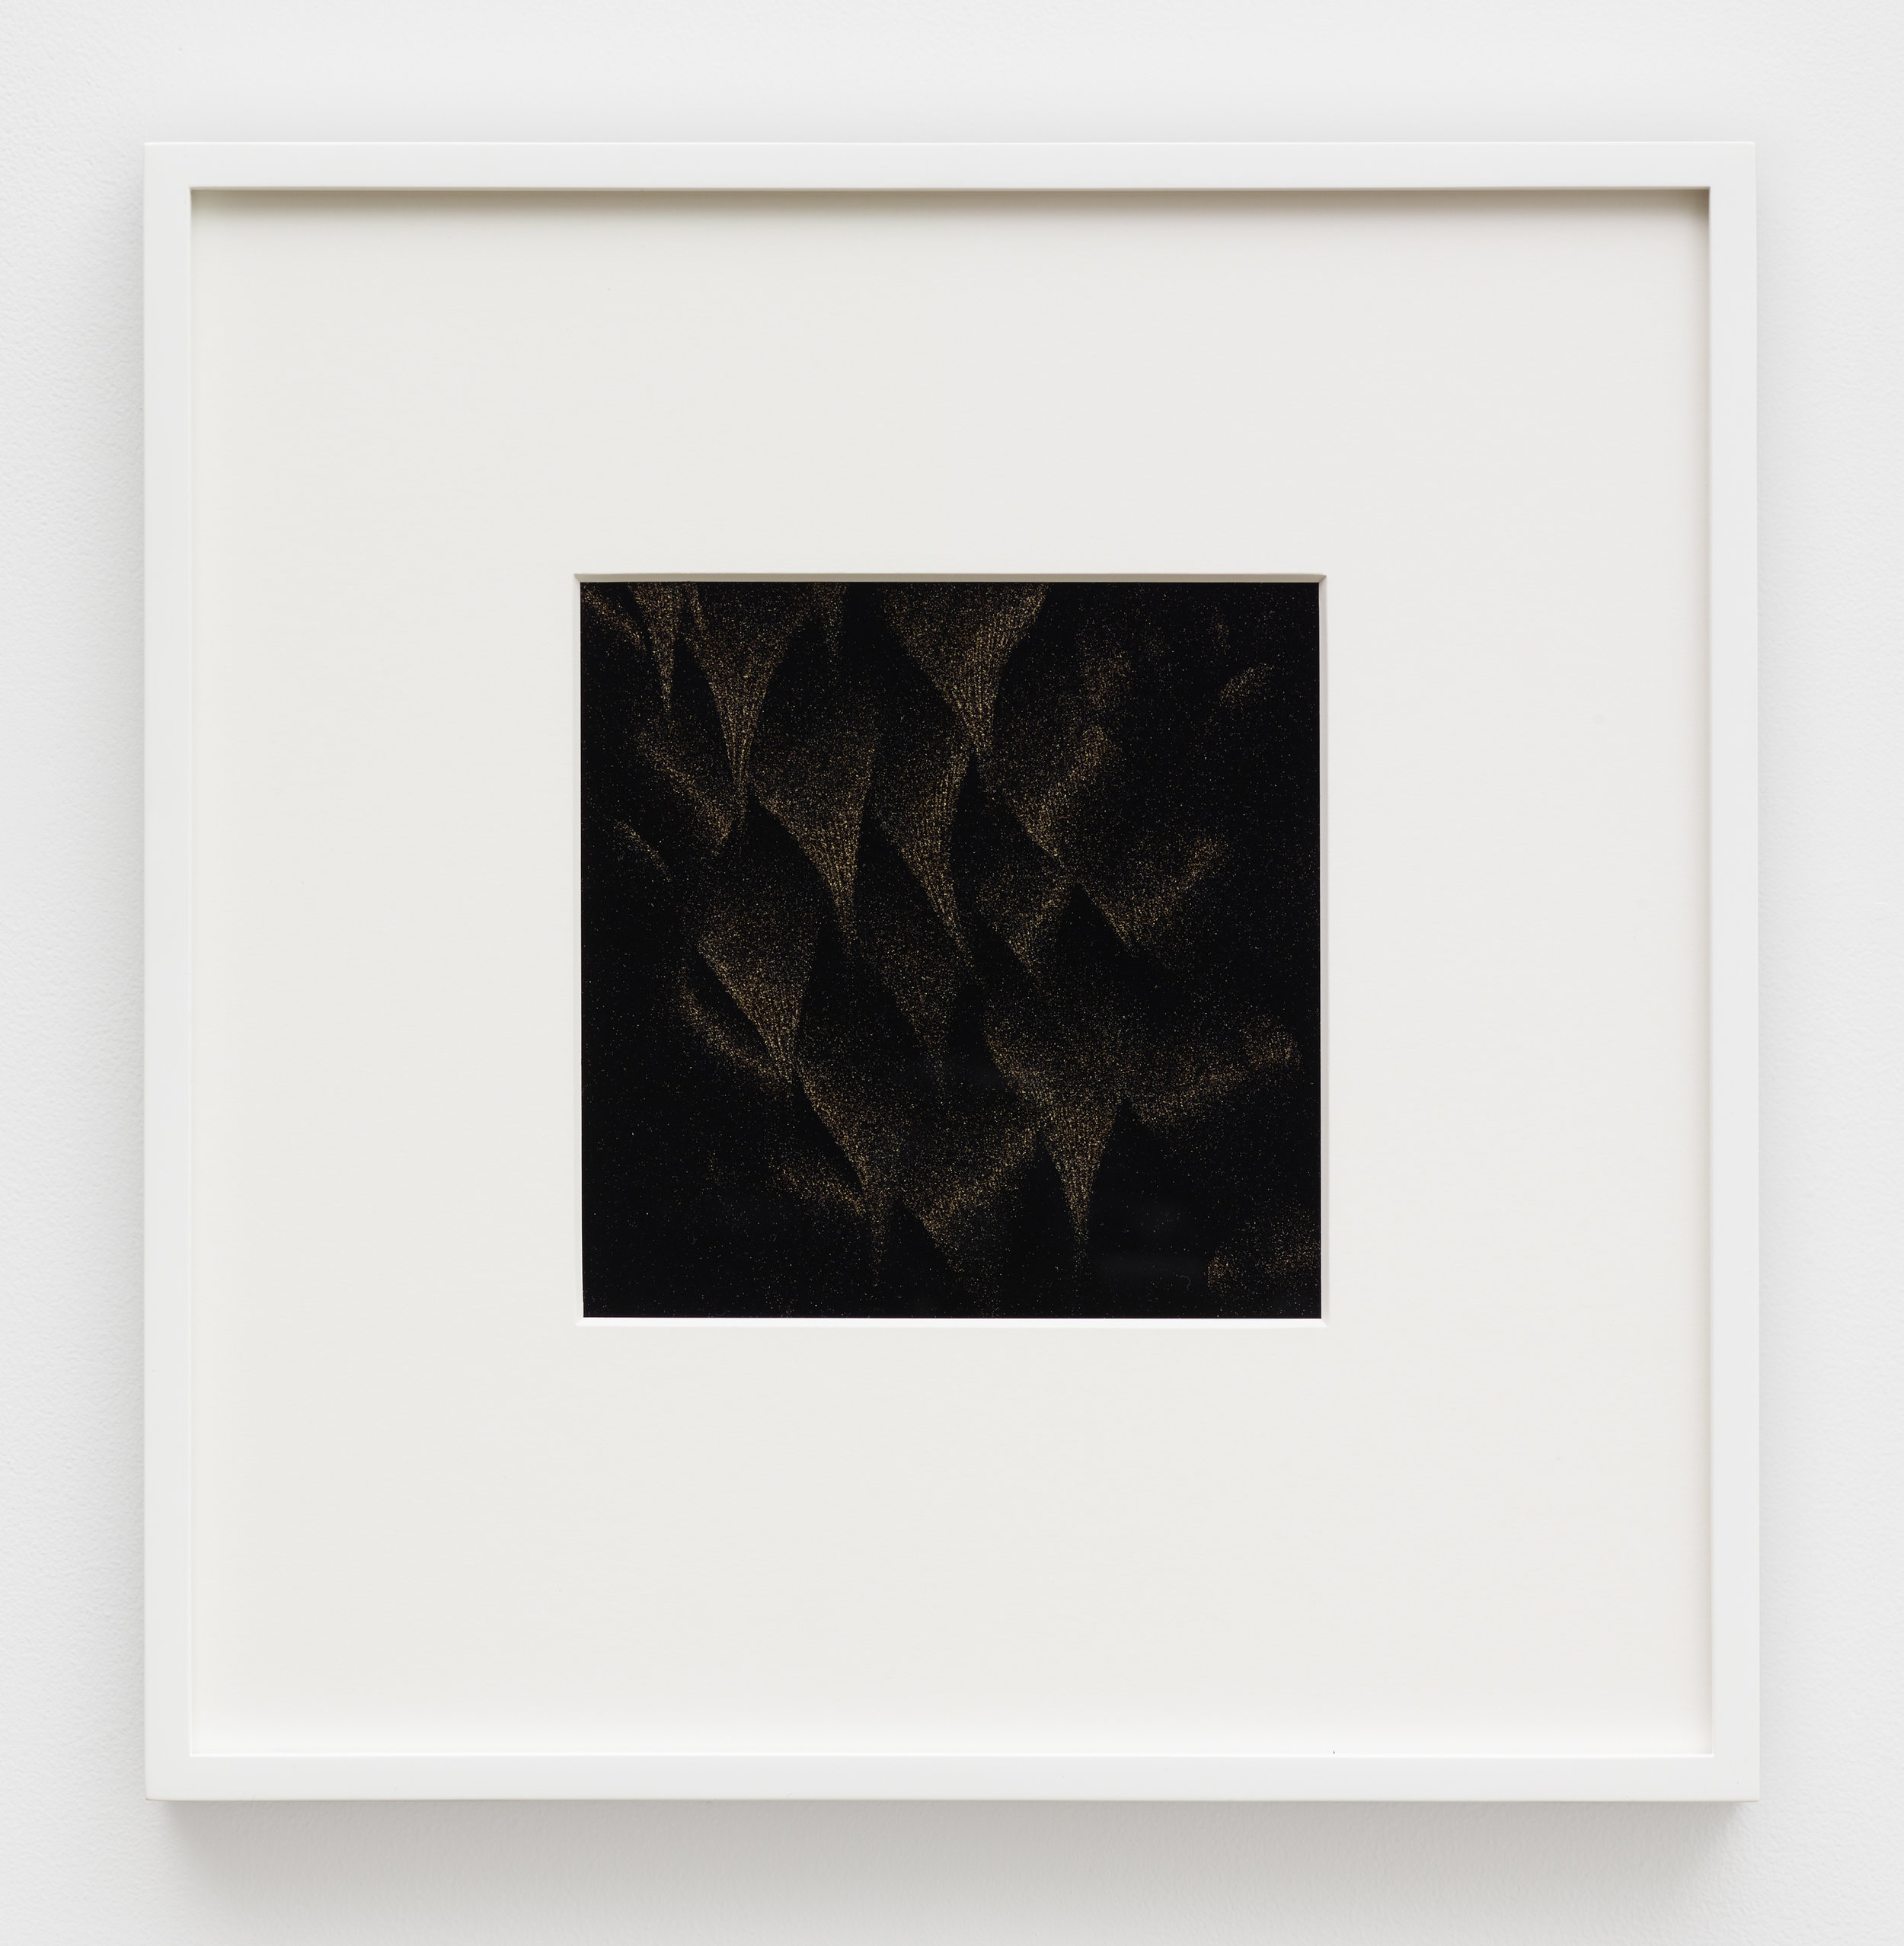 Kerry Tribe, Parnassius mnemosyne, 2018, Pigment print.